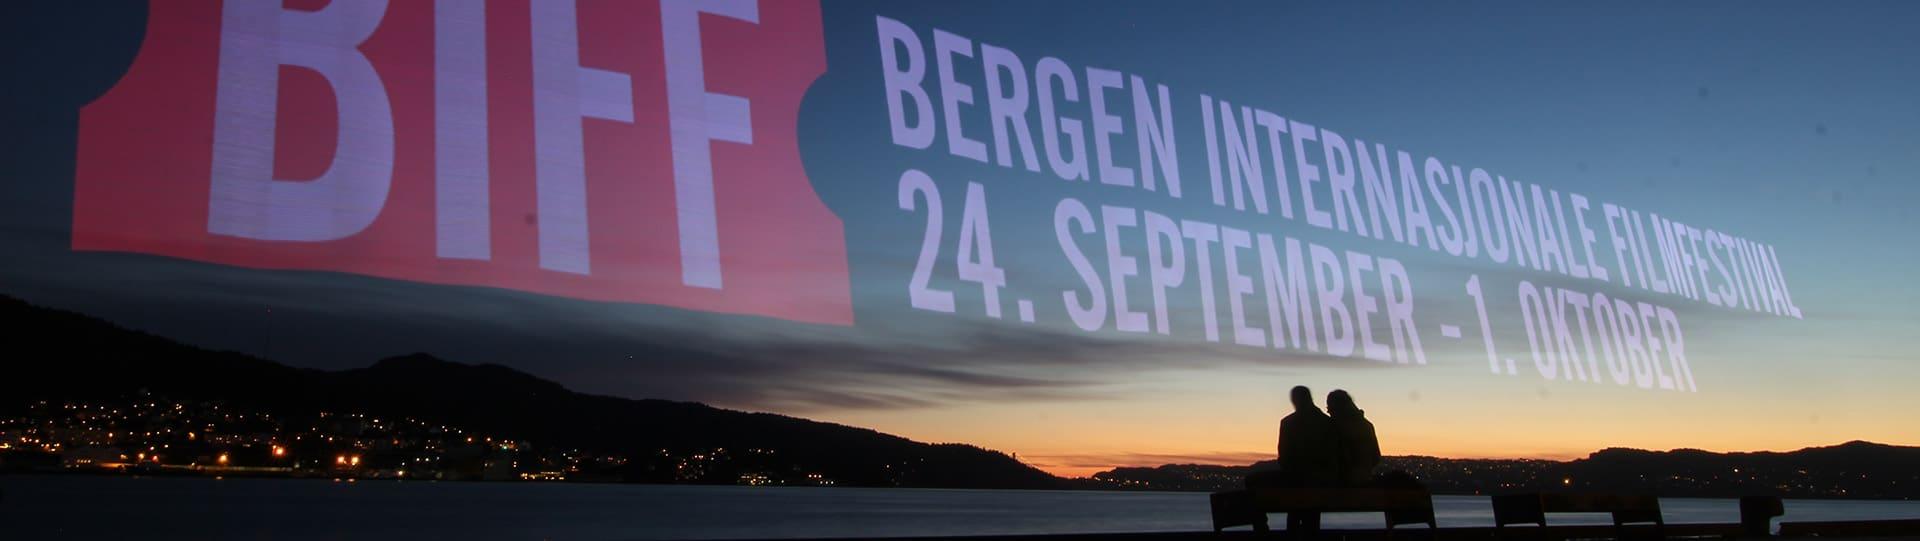 Bergen Filmfestival 2014